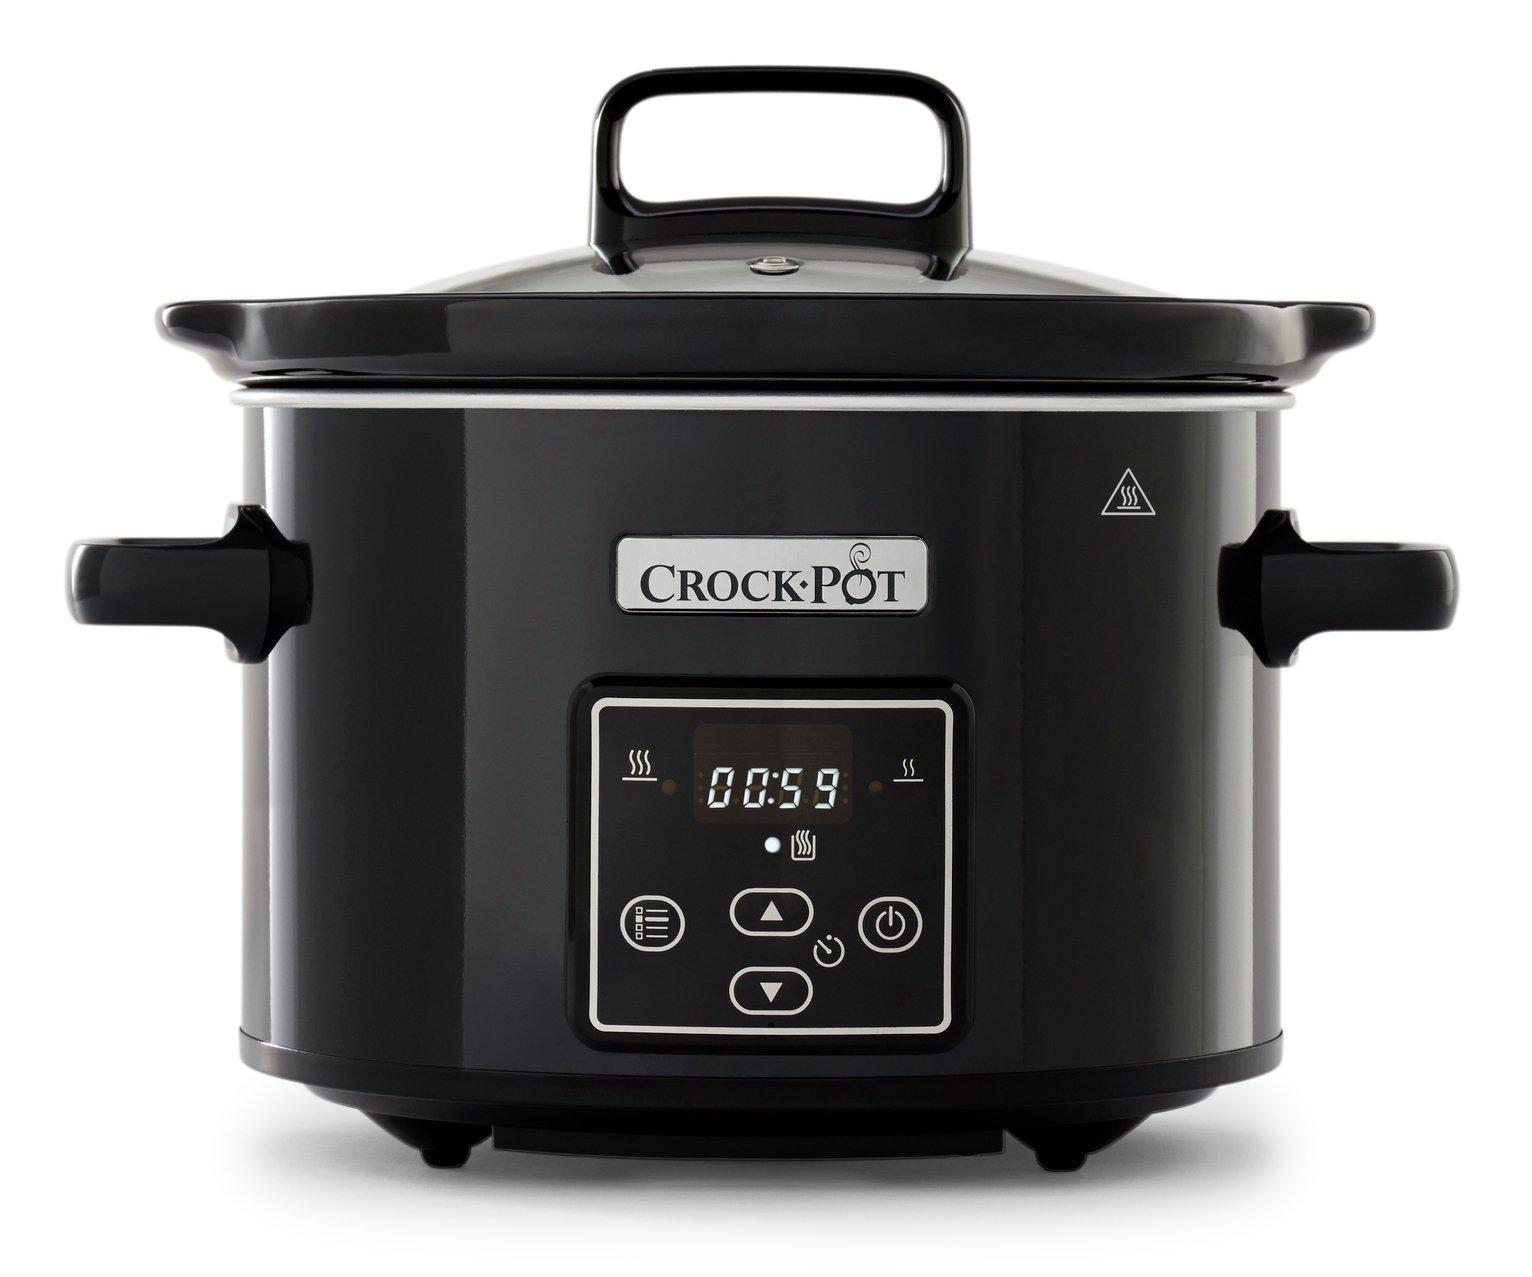 Crock-Pot 2.4L Digital Slow Cooker - Black